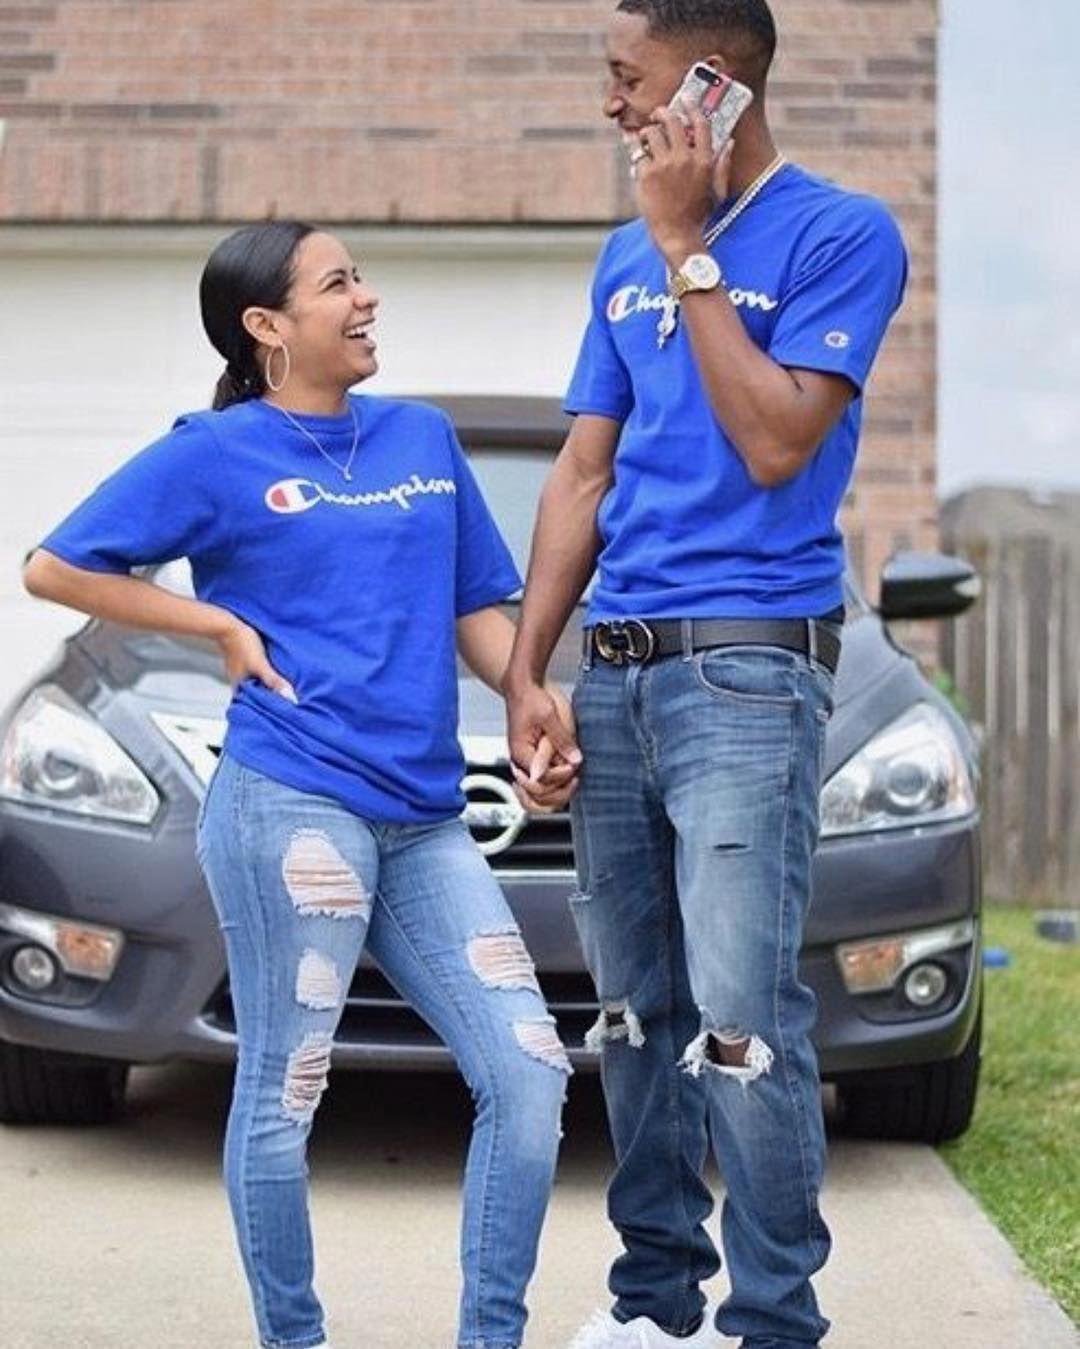 couplesmatchingoutfit #couplegoals #baegoals | Matching